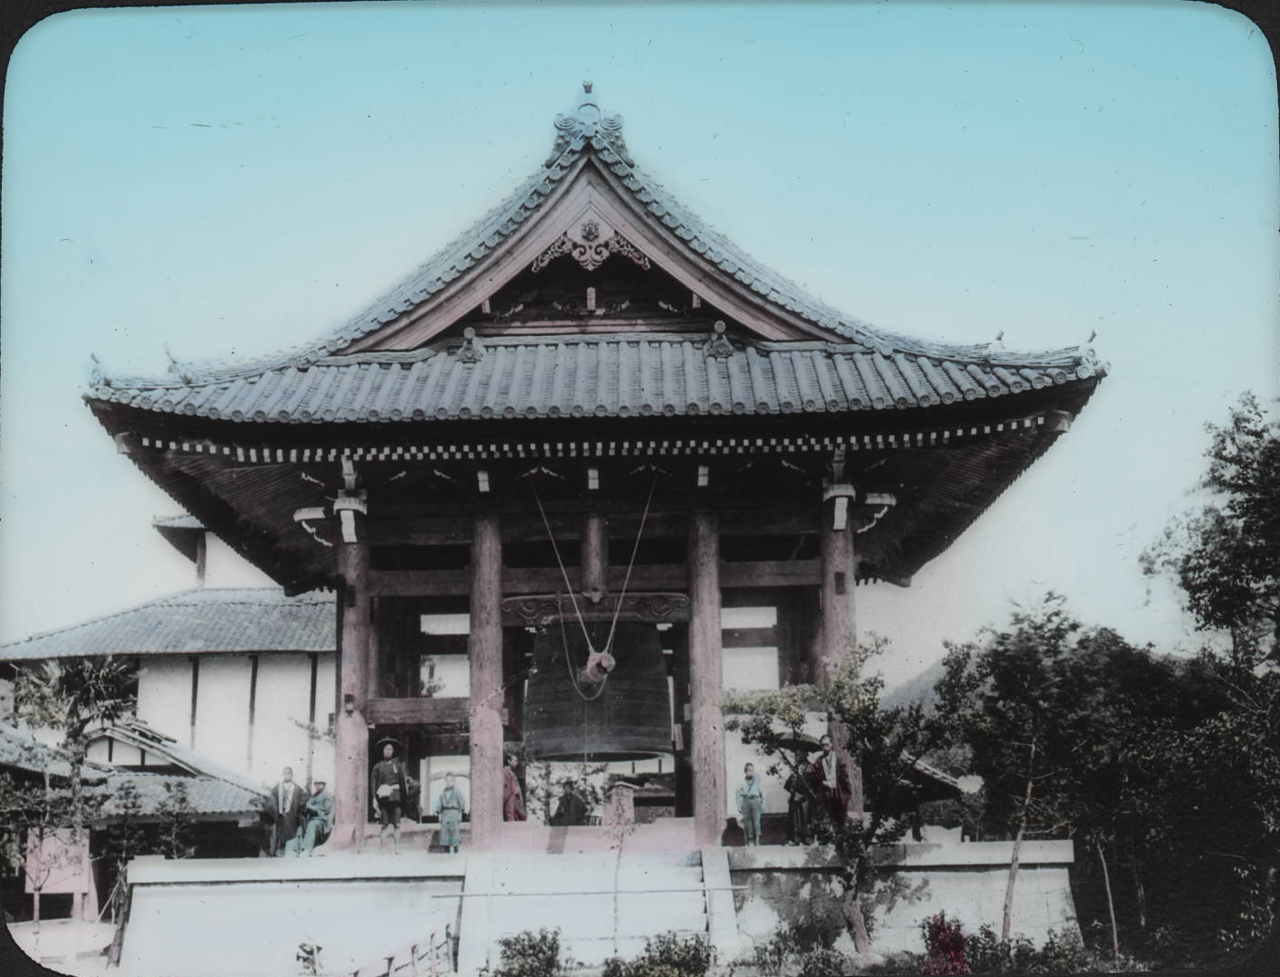 Киото. Колокольня над Дайбуцу